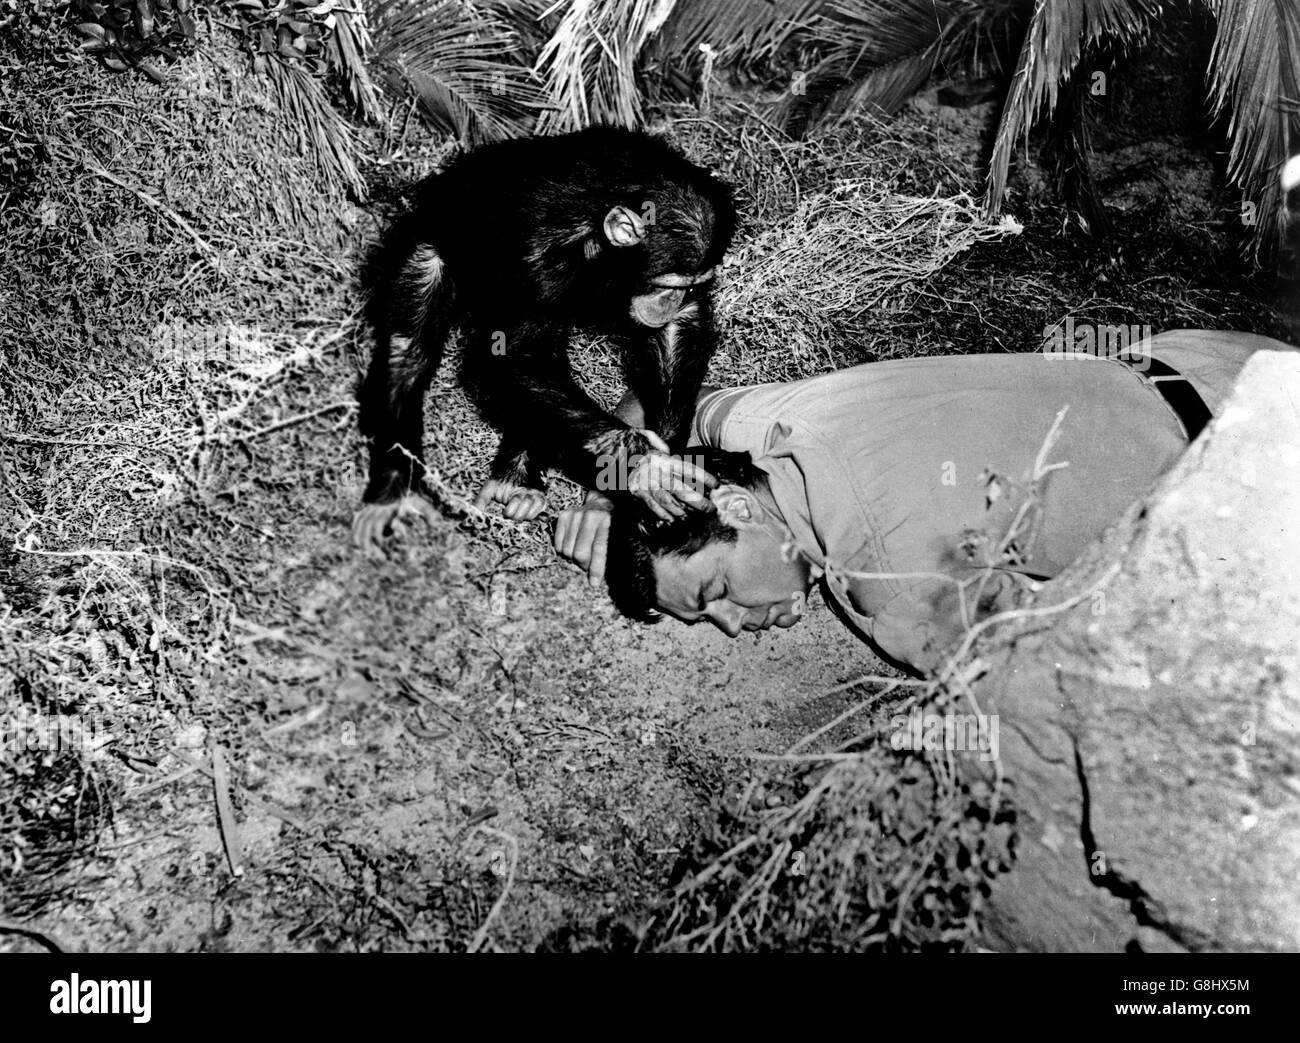 Cannibal Attack, USA 1954, Regie: Lee Sholem, Darsteller: Johnny Weissmuller mit Schimpanse Kimba - Stock Image